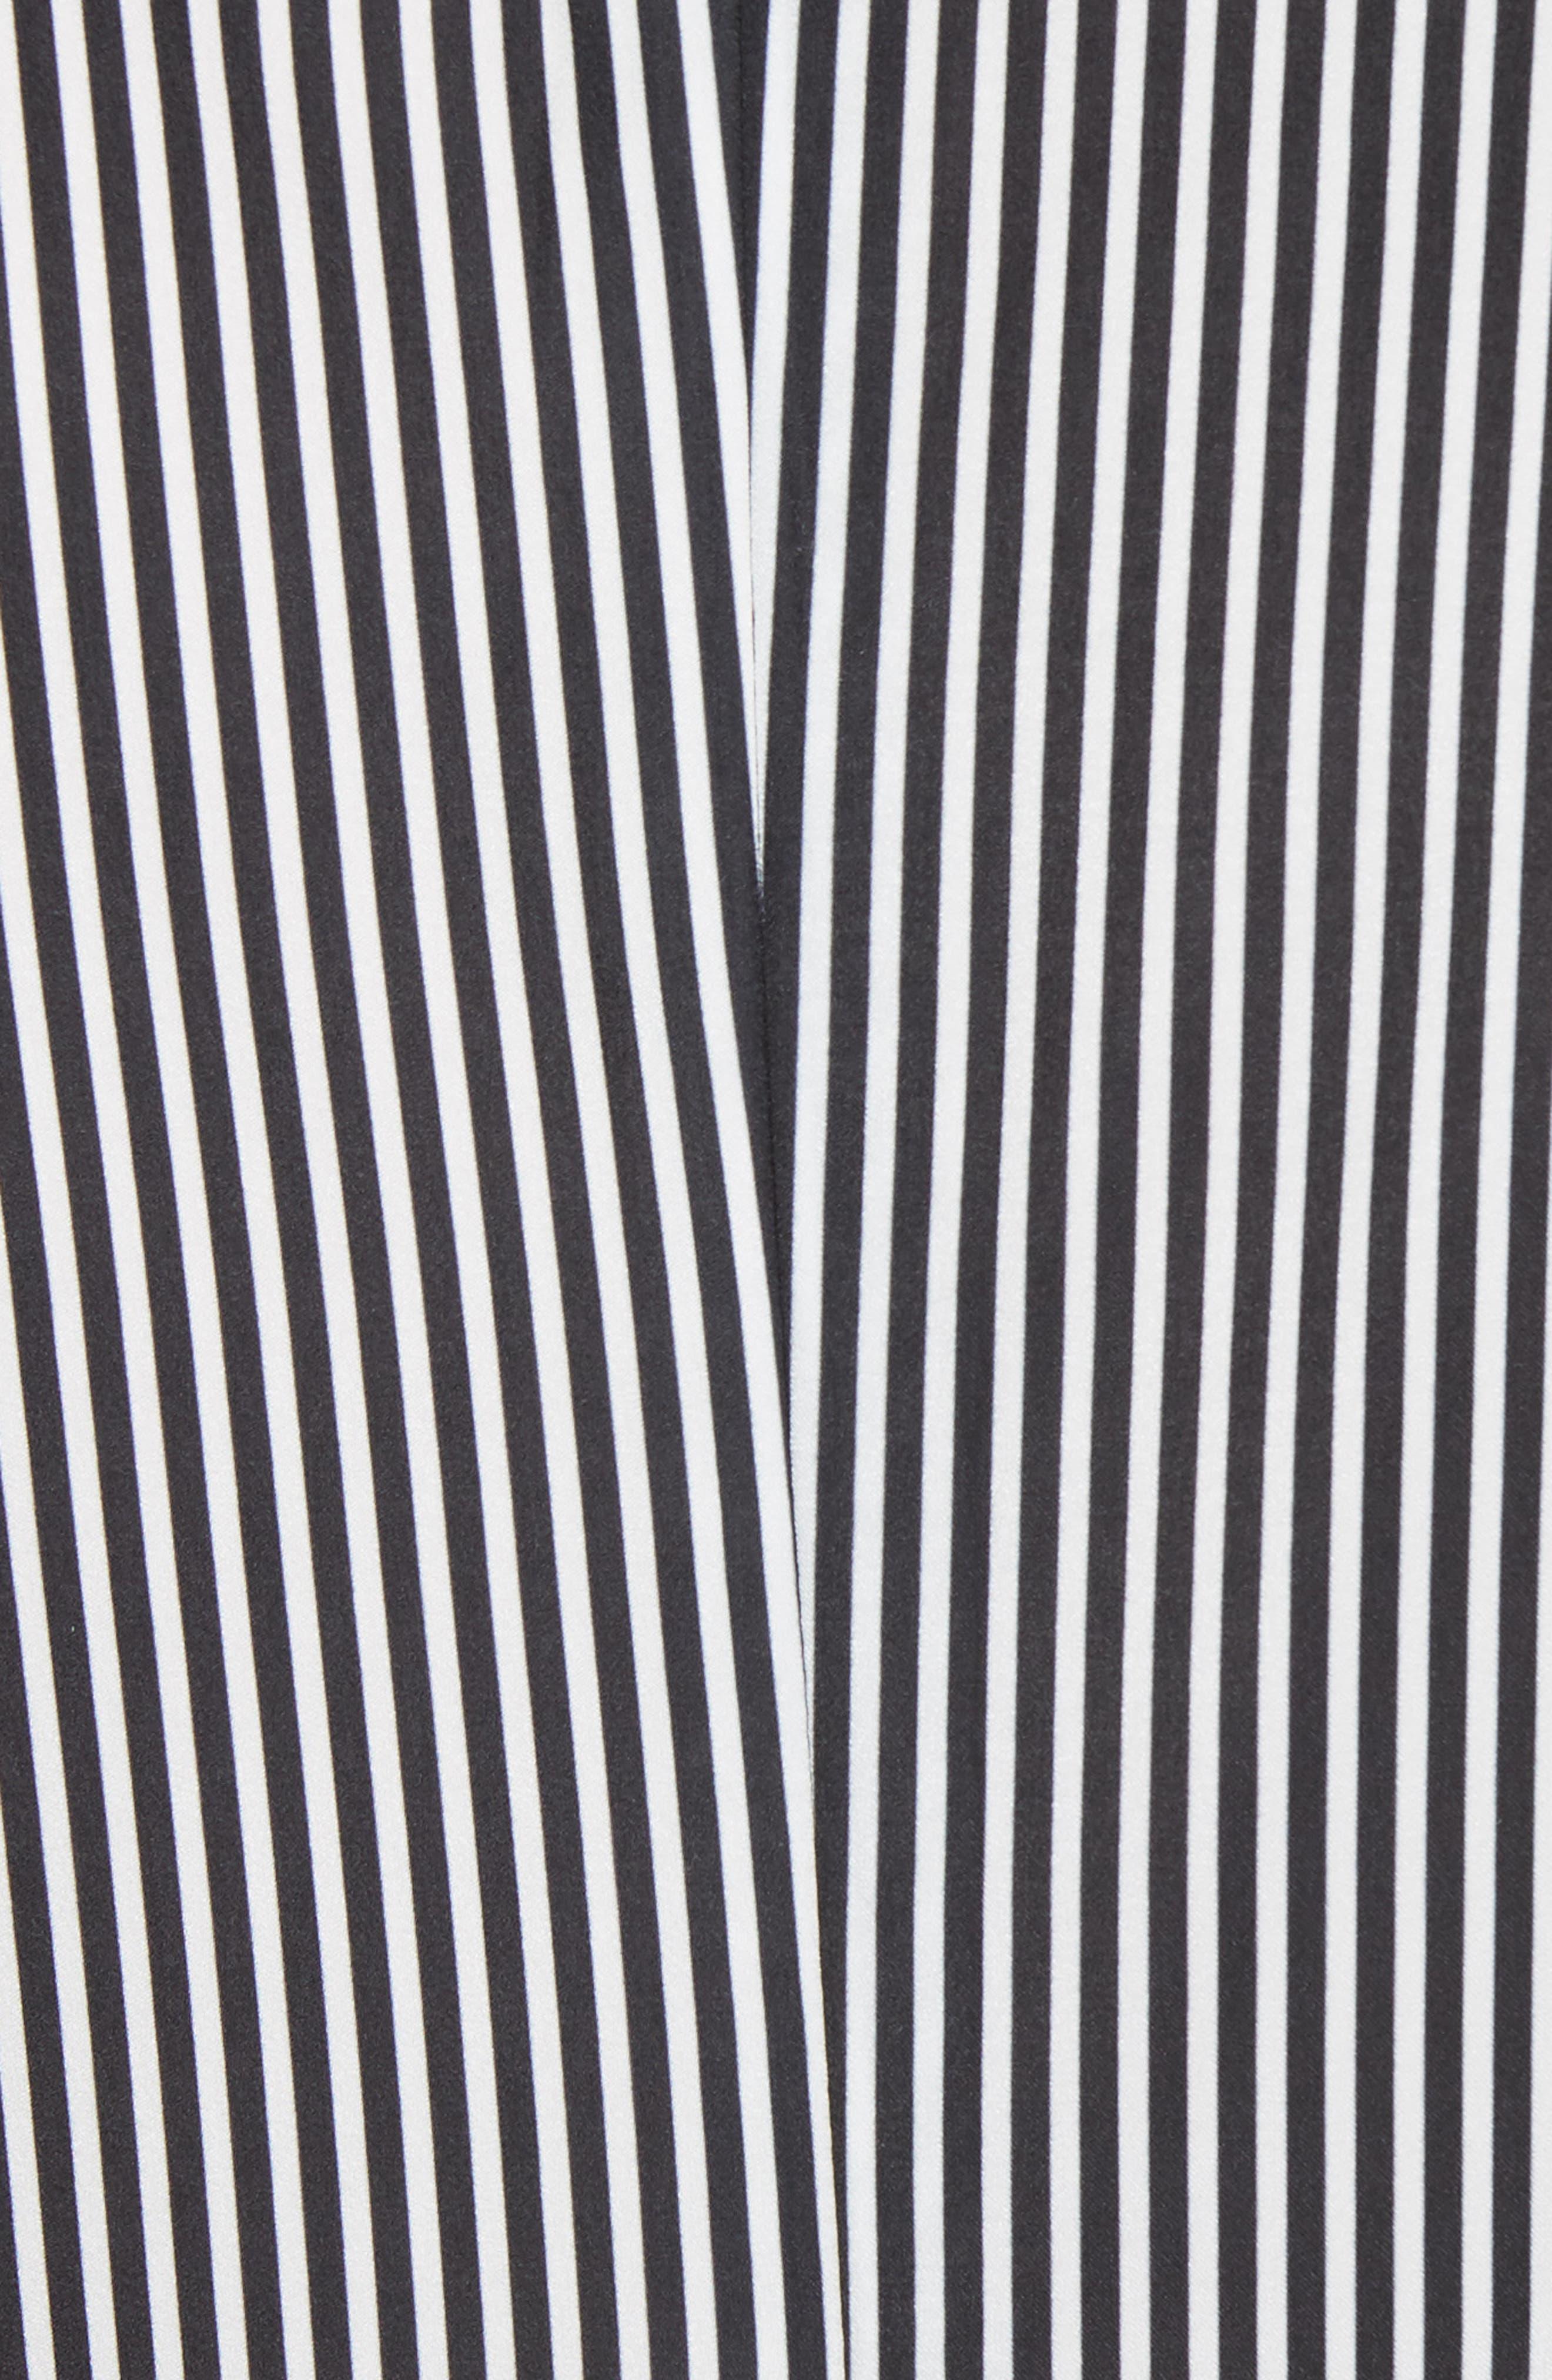 Radise Cold Shoulder Ruffled Minidress,                             Alternate thumbnail 5, color,                             Stripe